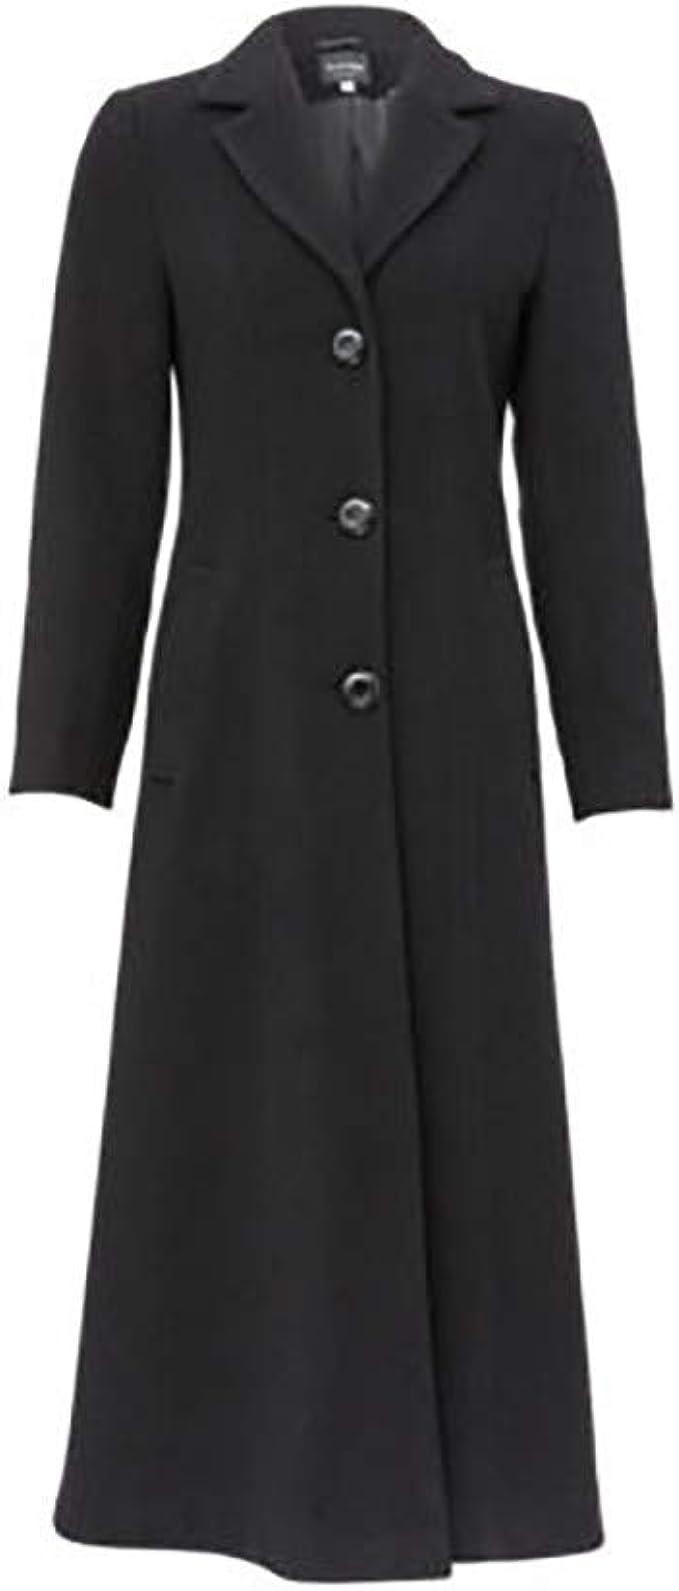 Anastasia Womens Black Long Smart Coat